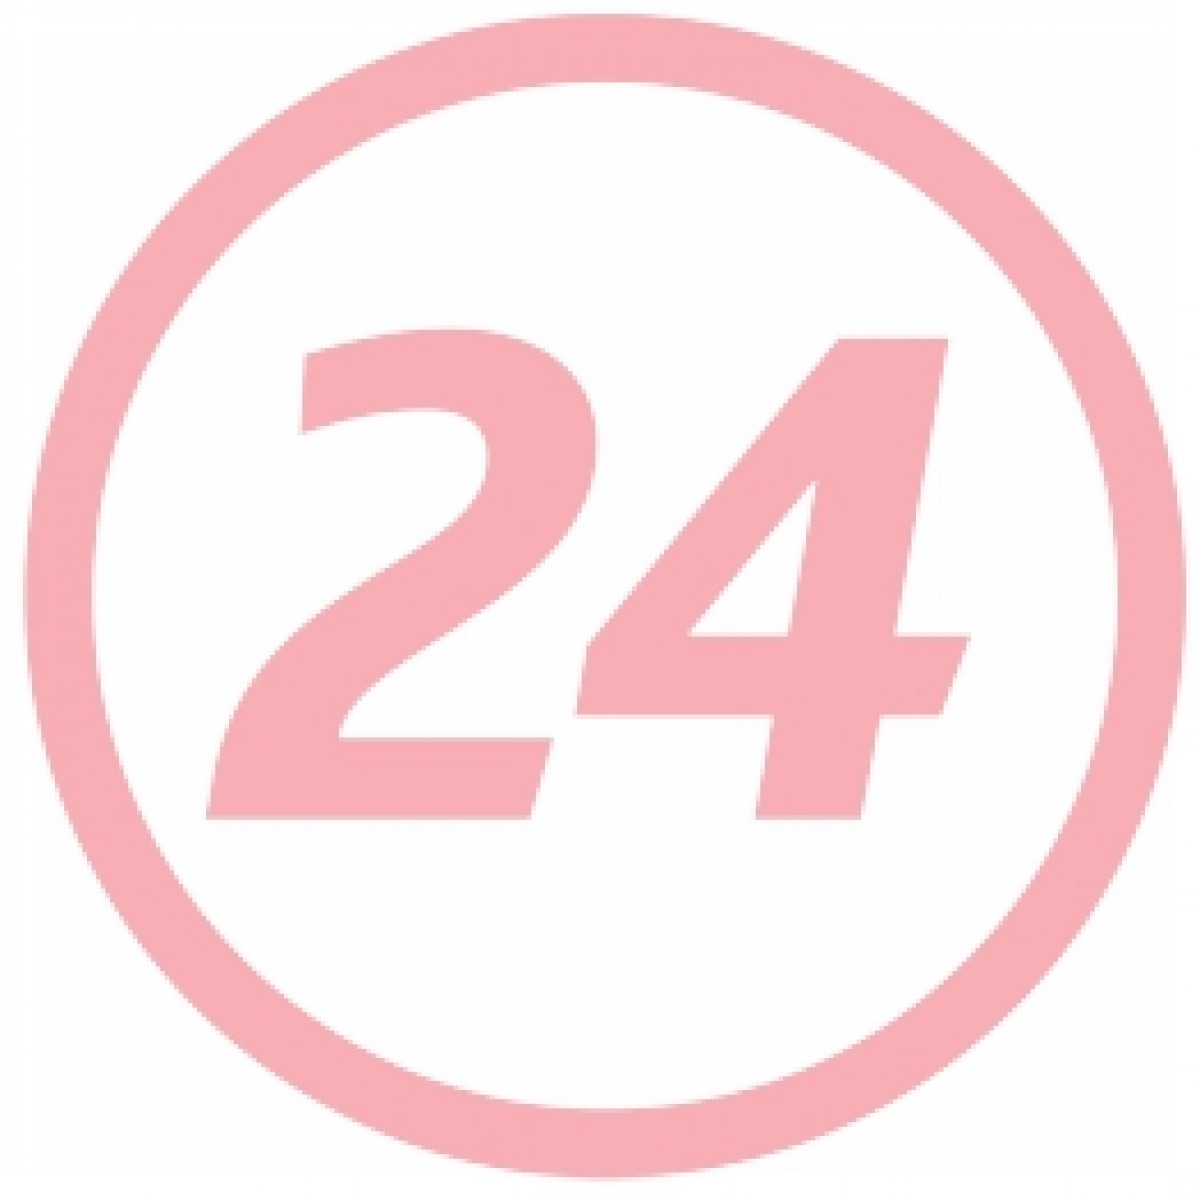 Chicco Kit De Siguranta Pentru Priza Usa Dulap Frigider Si Lampa Veghe +5 Luni, Kit, 1buc